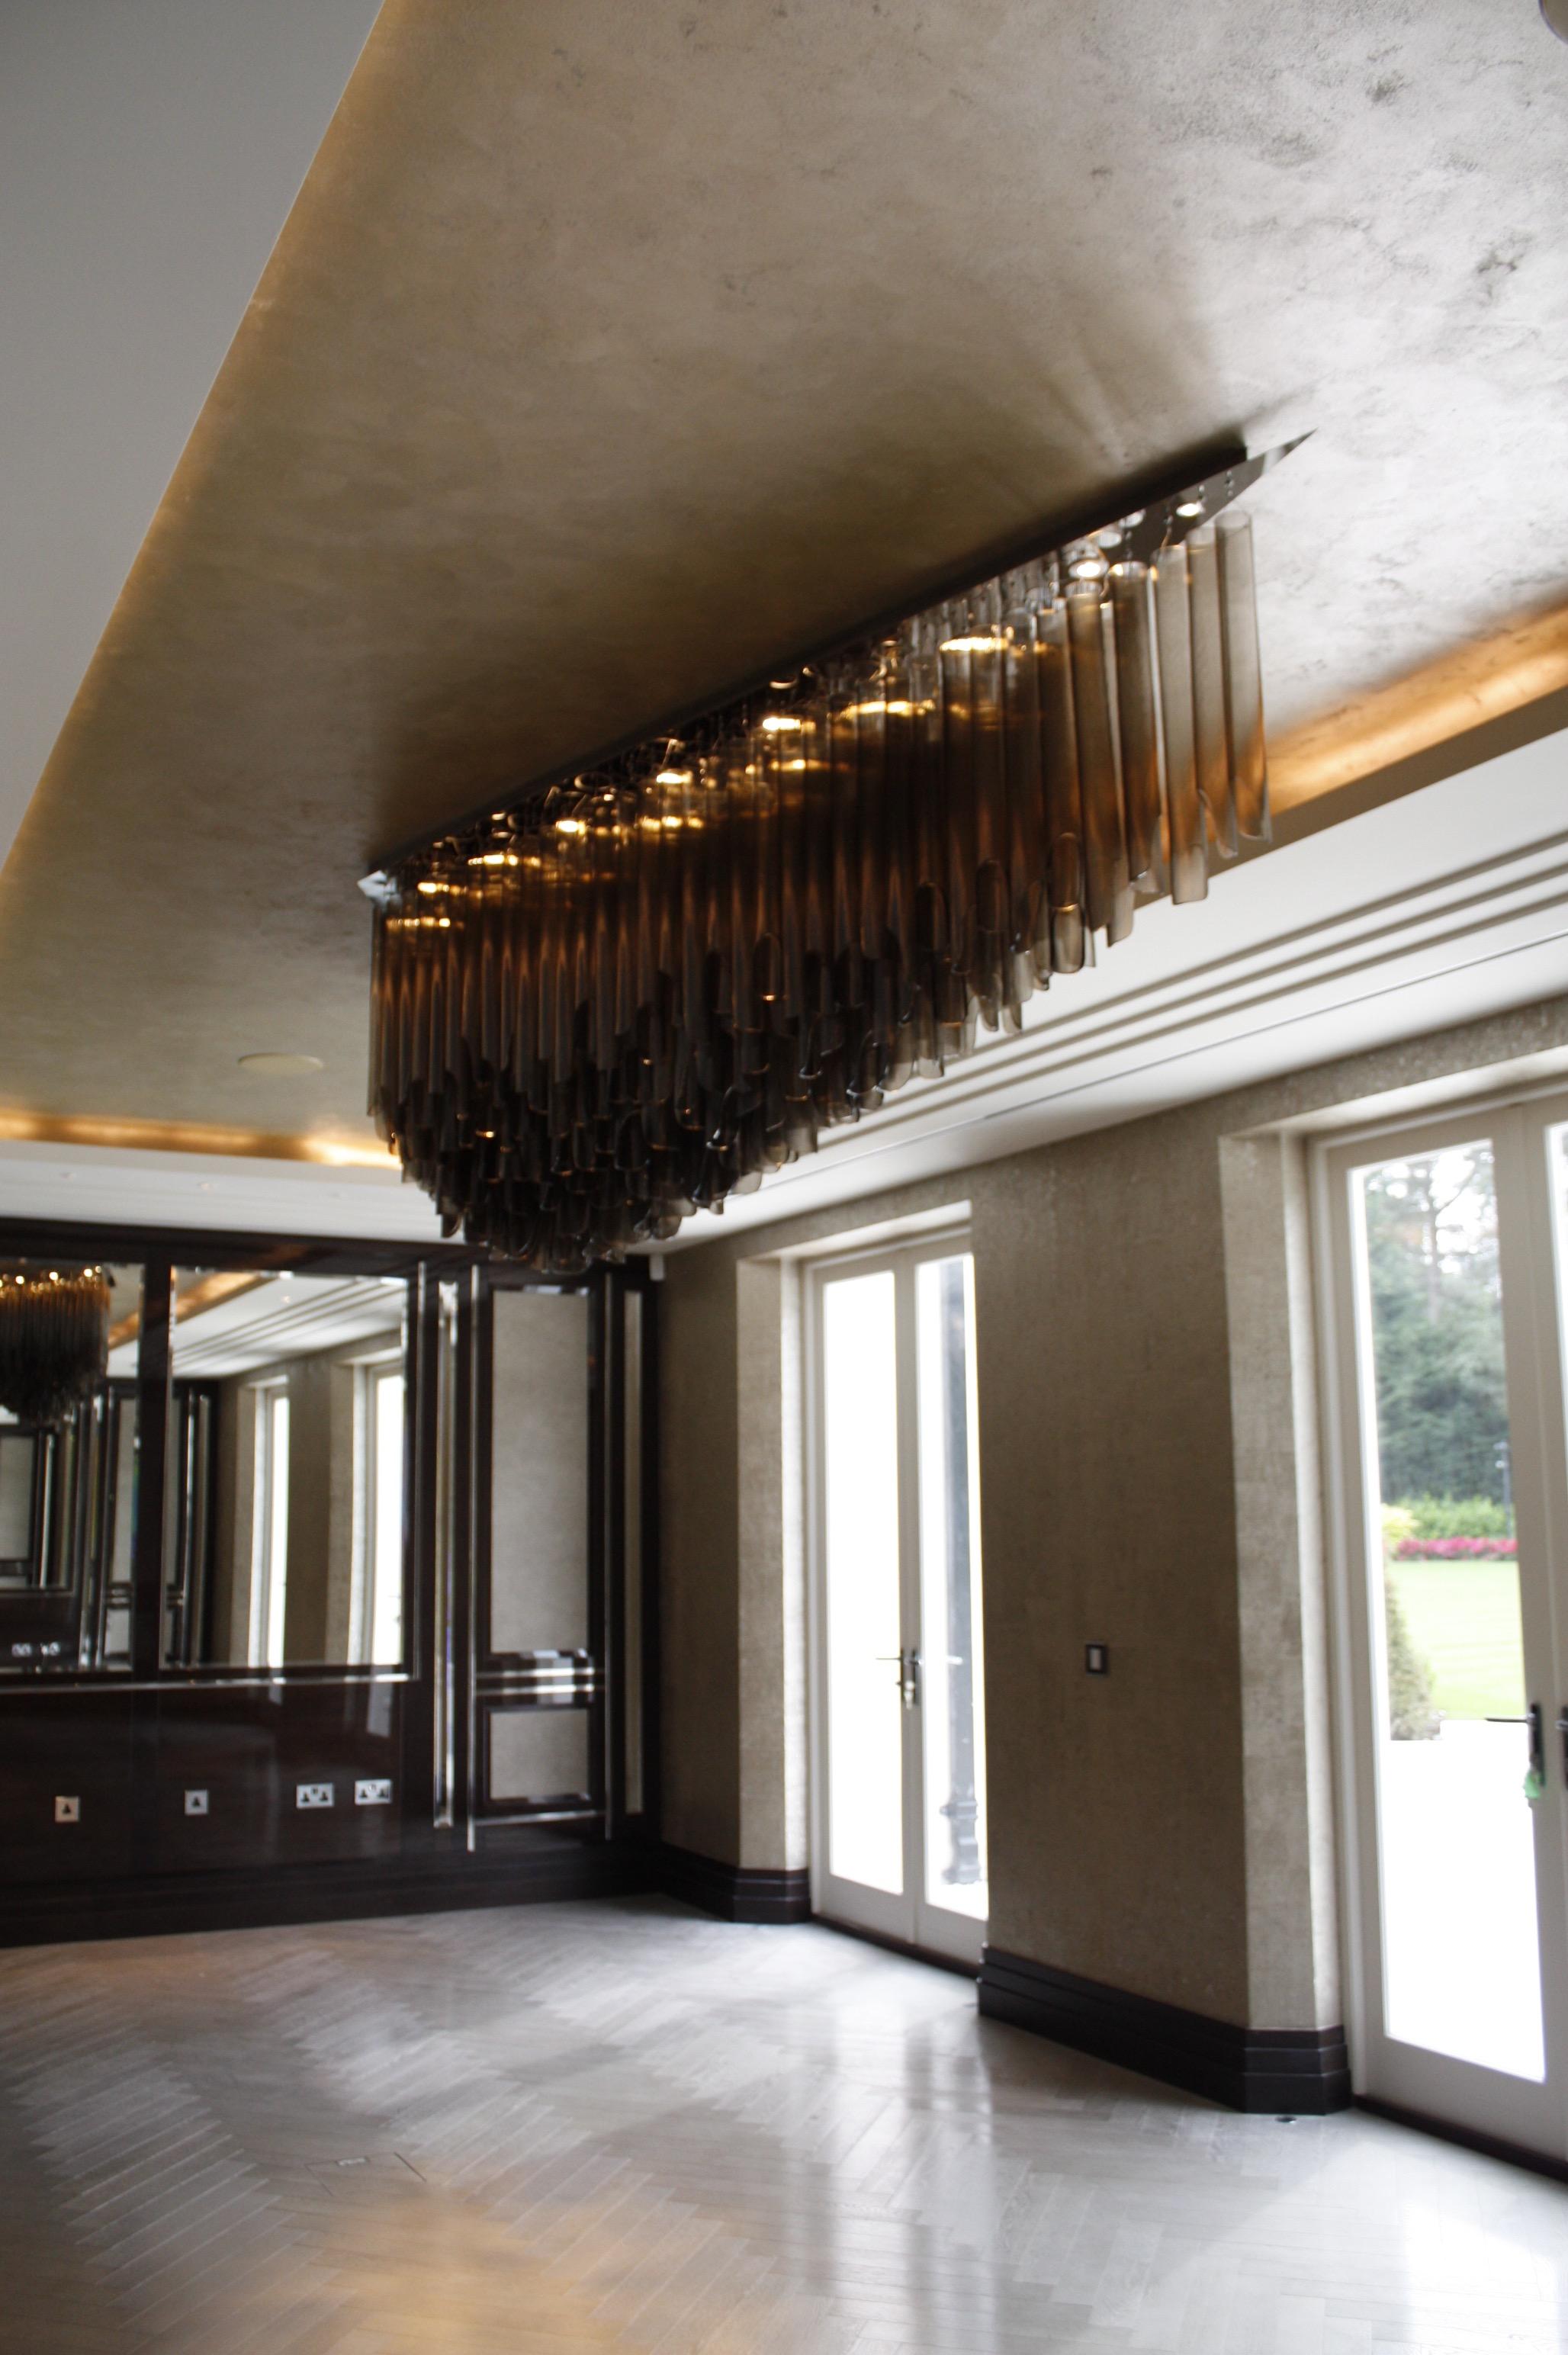 bespoke gold textured italian metallic coffer ceiling interior design fabulous finishes uk -1.jpg